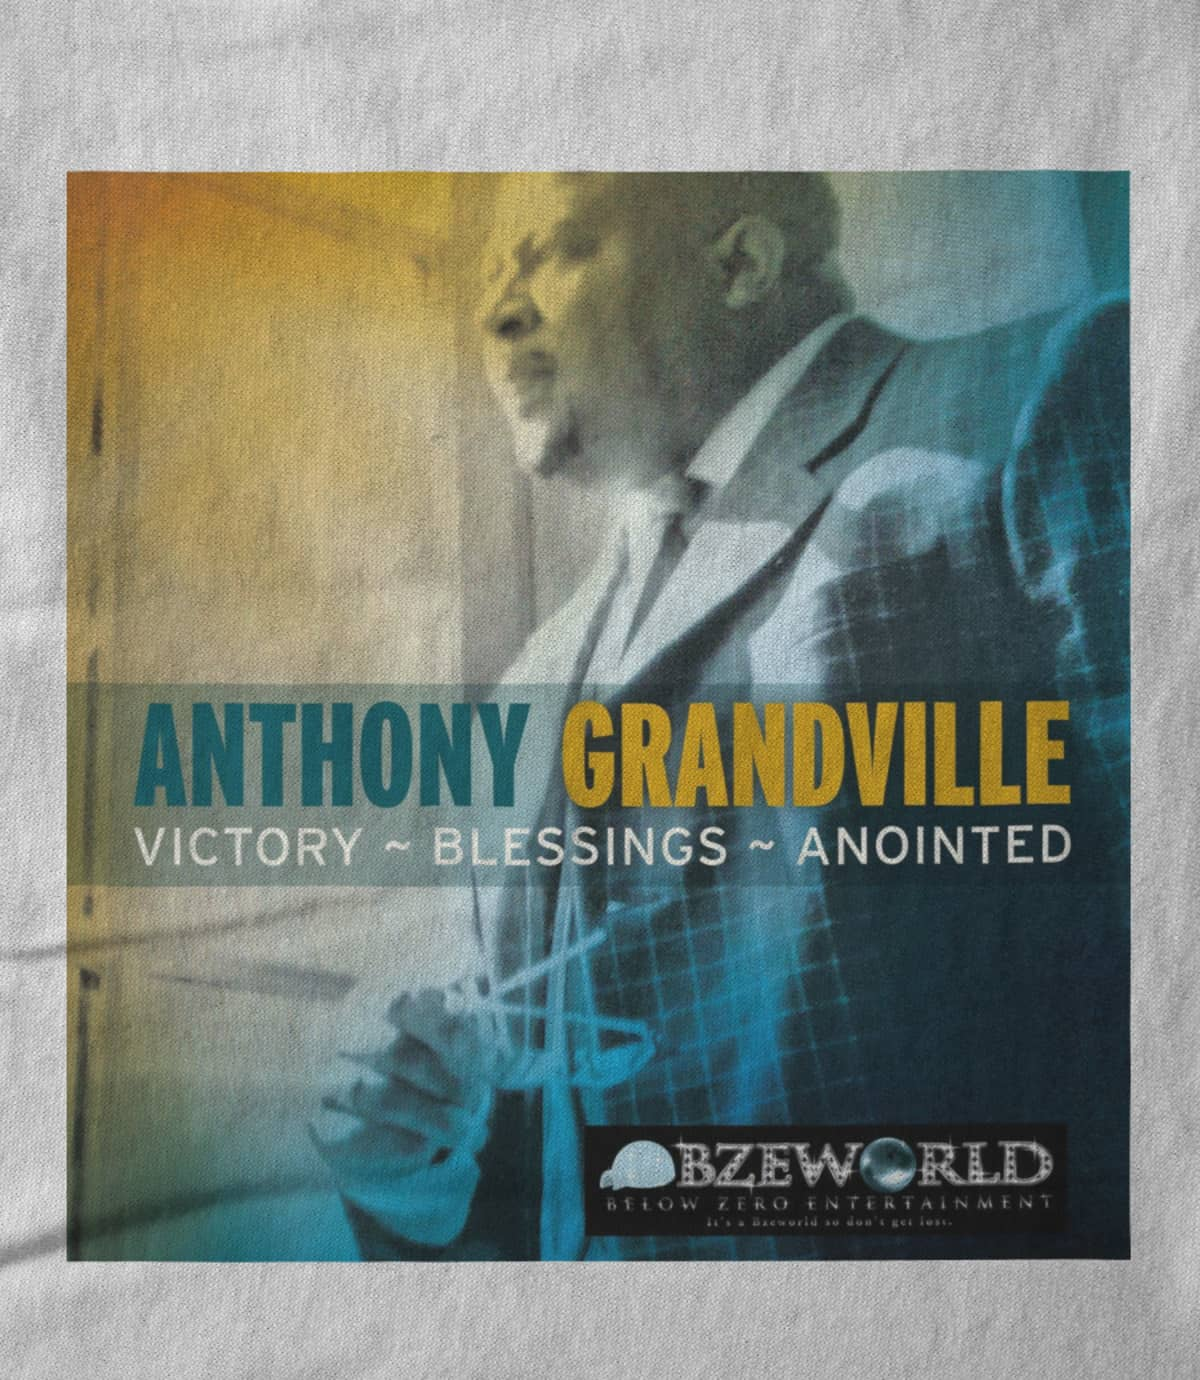 Anthony Grandville